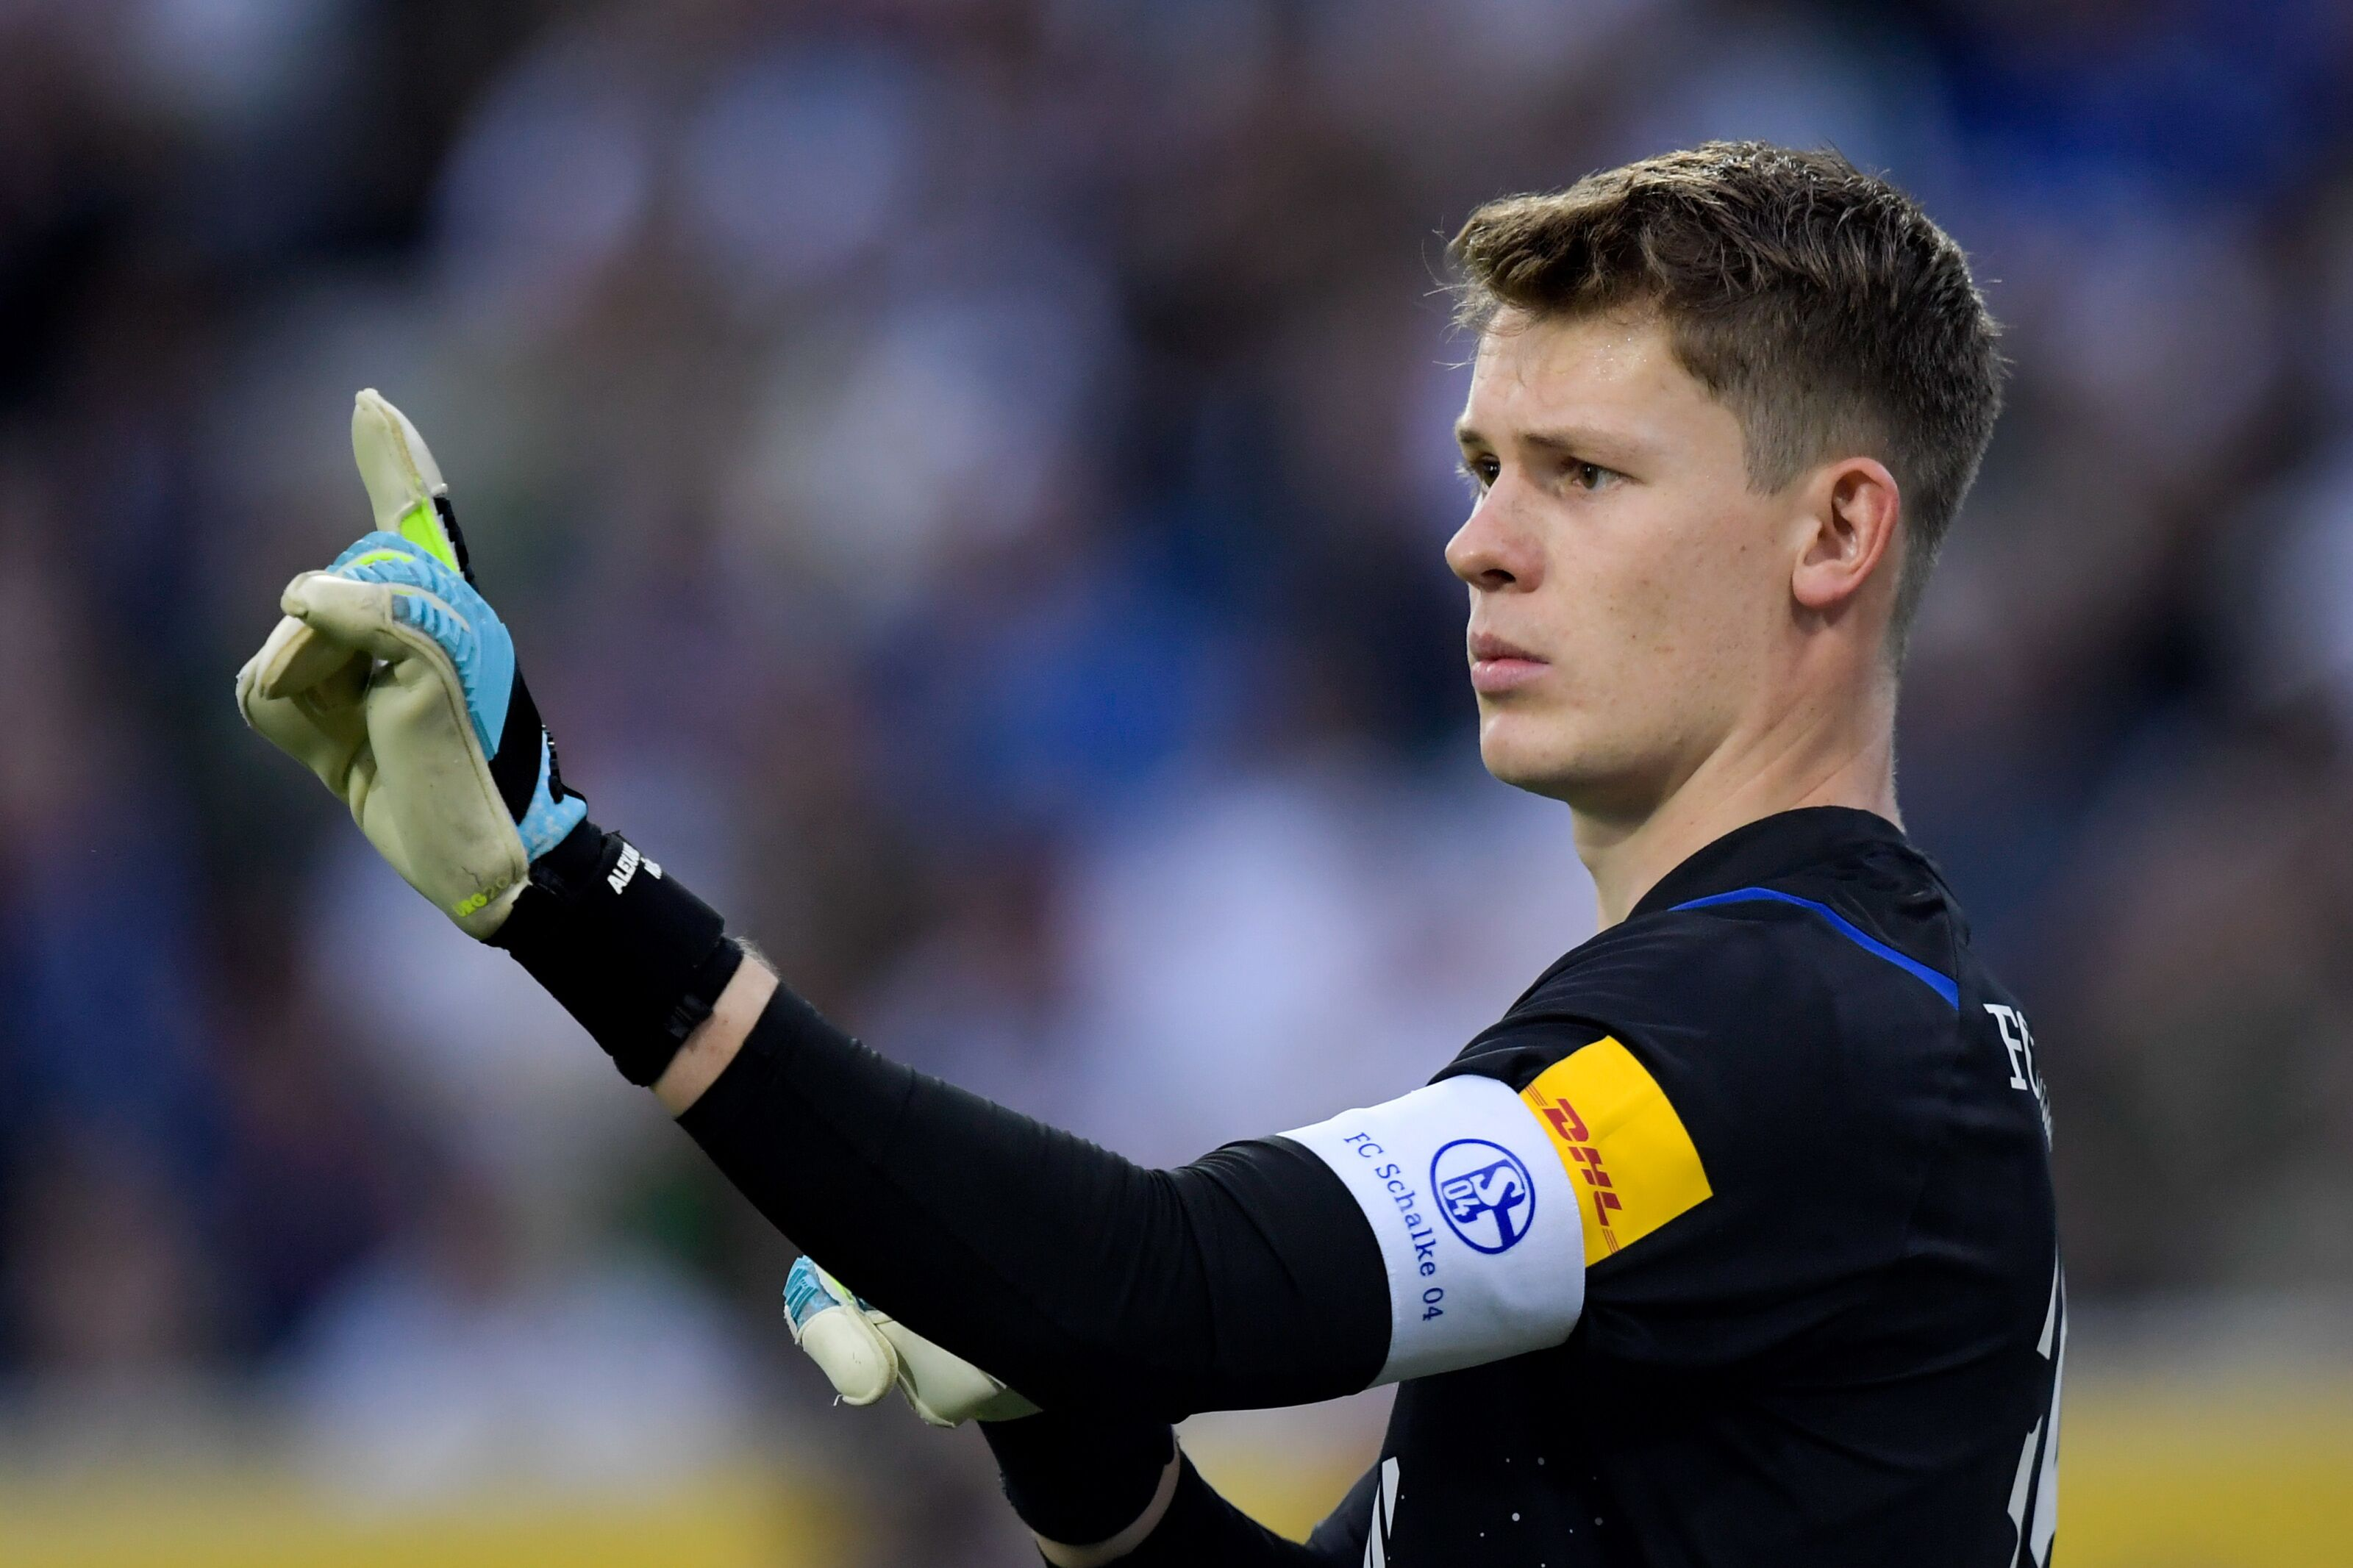 Schalke: Alexander Nubel counter shows steps are being made